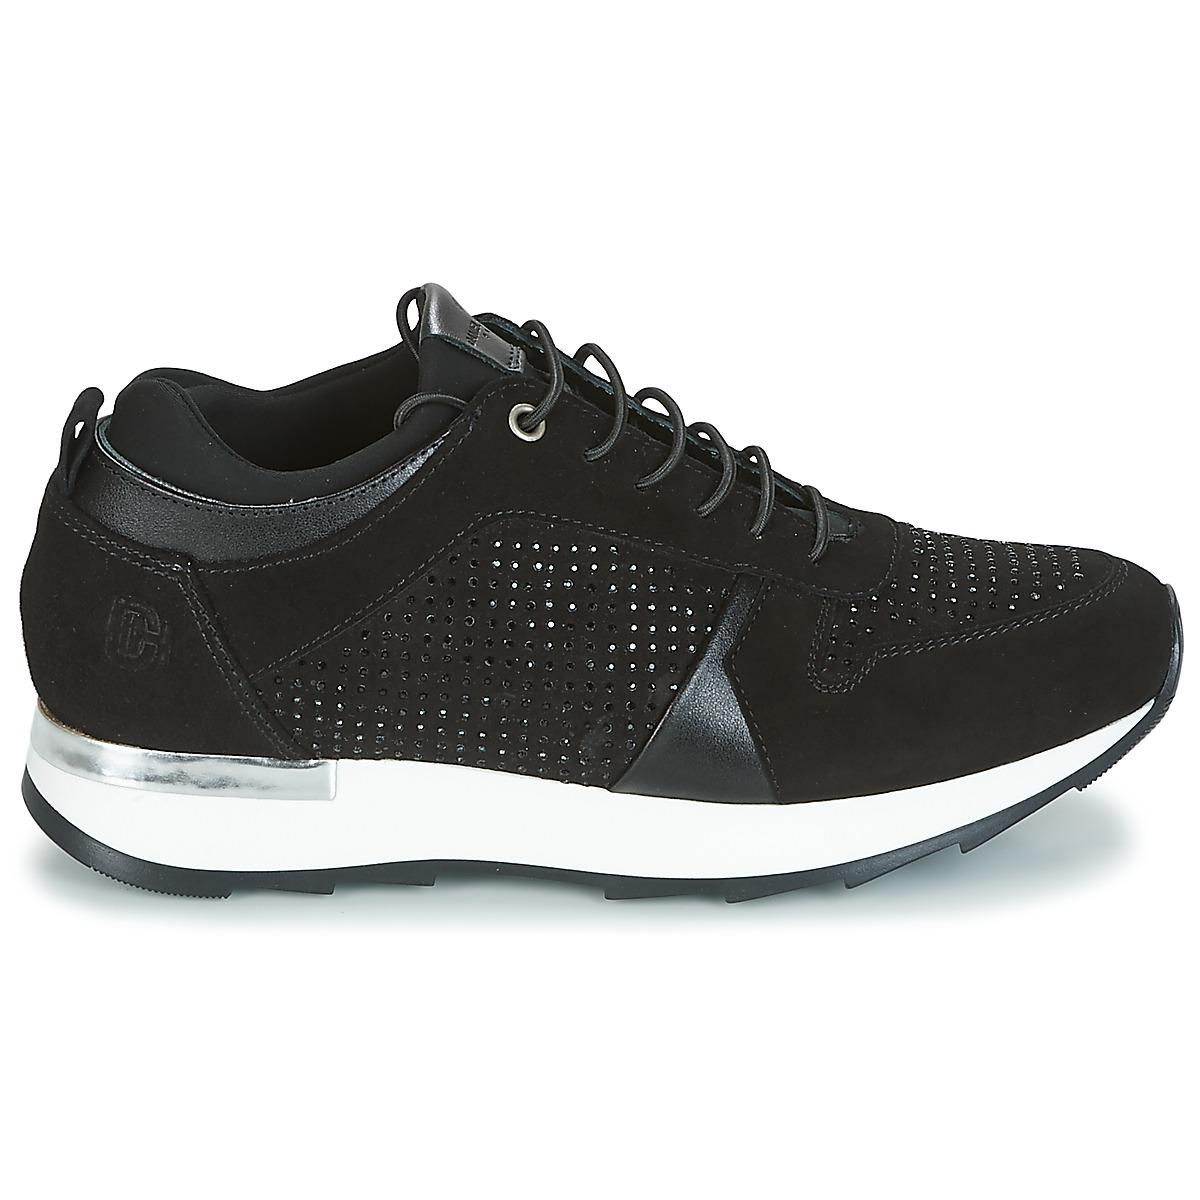 Daniel Hechter  Emmy Women's Shoes trainers In Black  Lyst  View  fullscreen